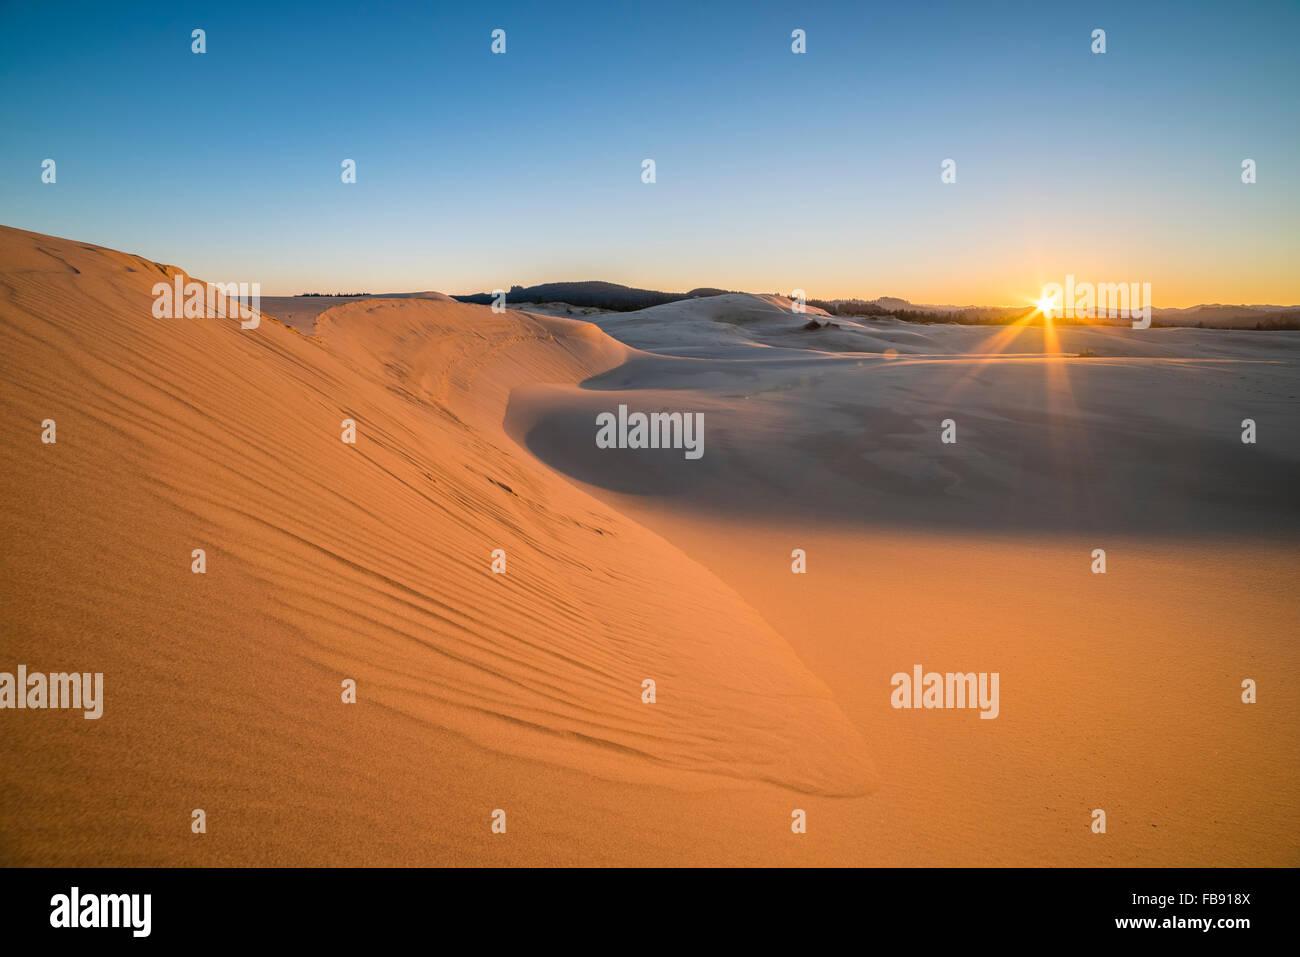 Sanddünen im Umpqua Dünen, Oregon Dunes National Recreation Area, Oregon Coast. Stockbild